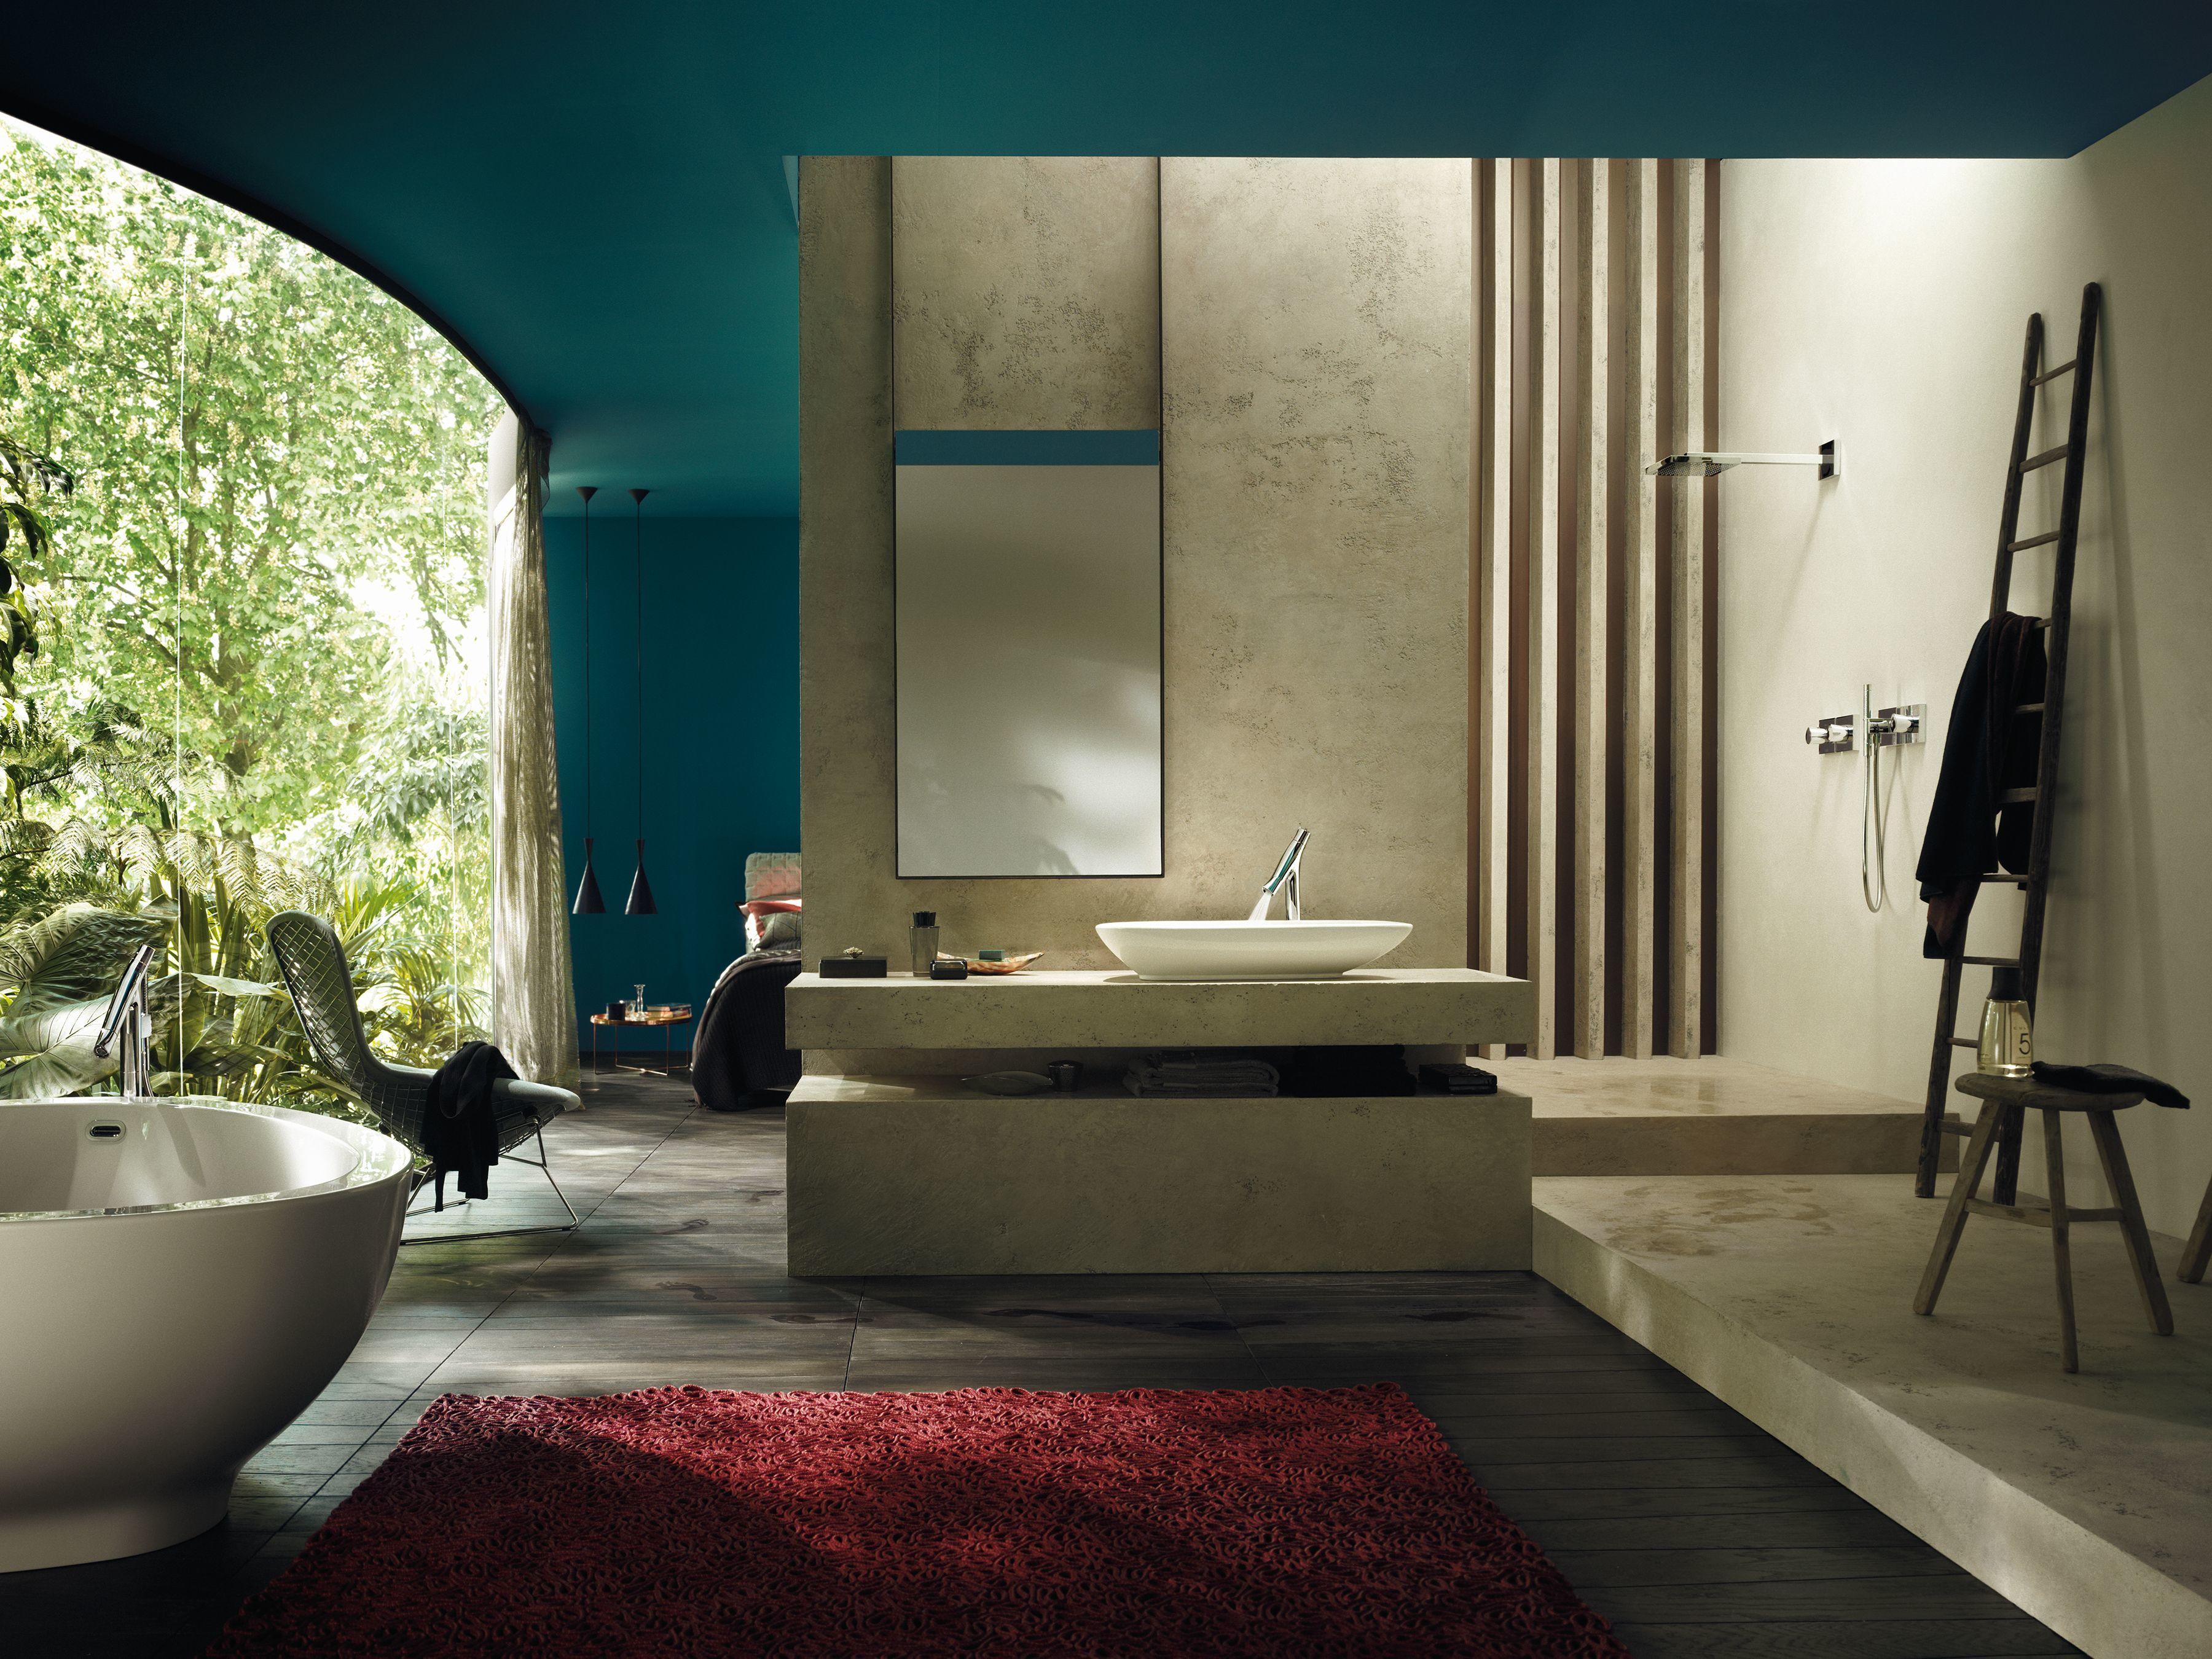 Amenajare Baie ZOISS Home Design - Hansgrohe-Axor REBAIE4